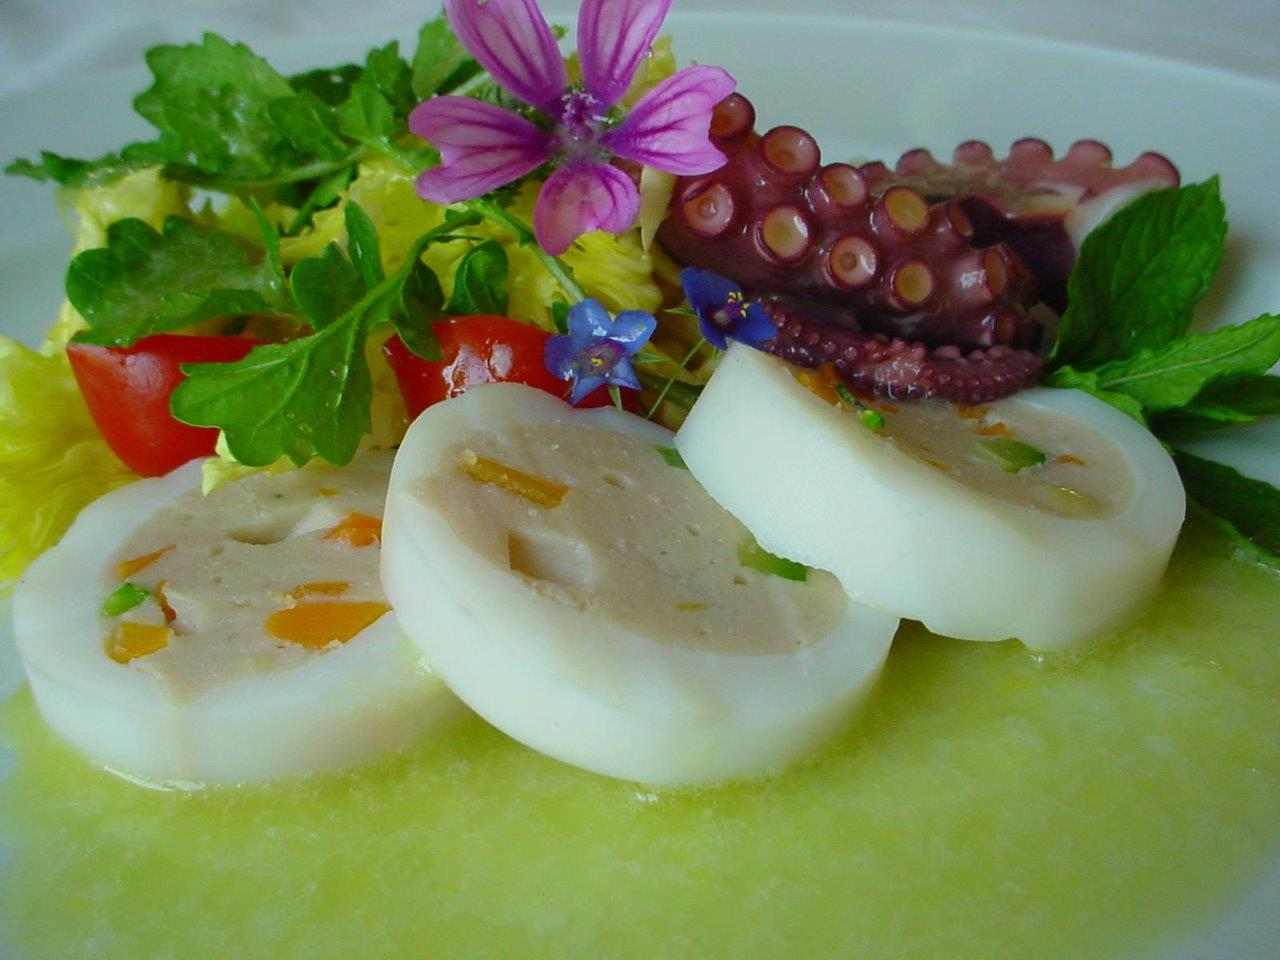 Calamari ripieni di gamberi con insalatine selvatiche